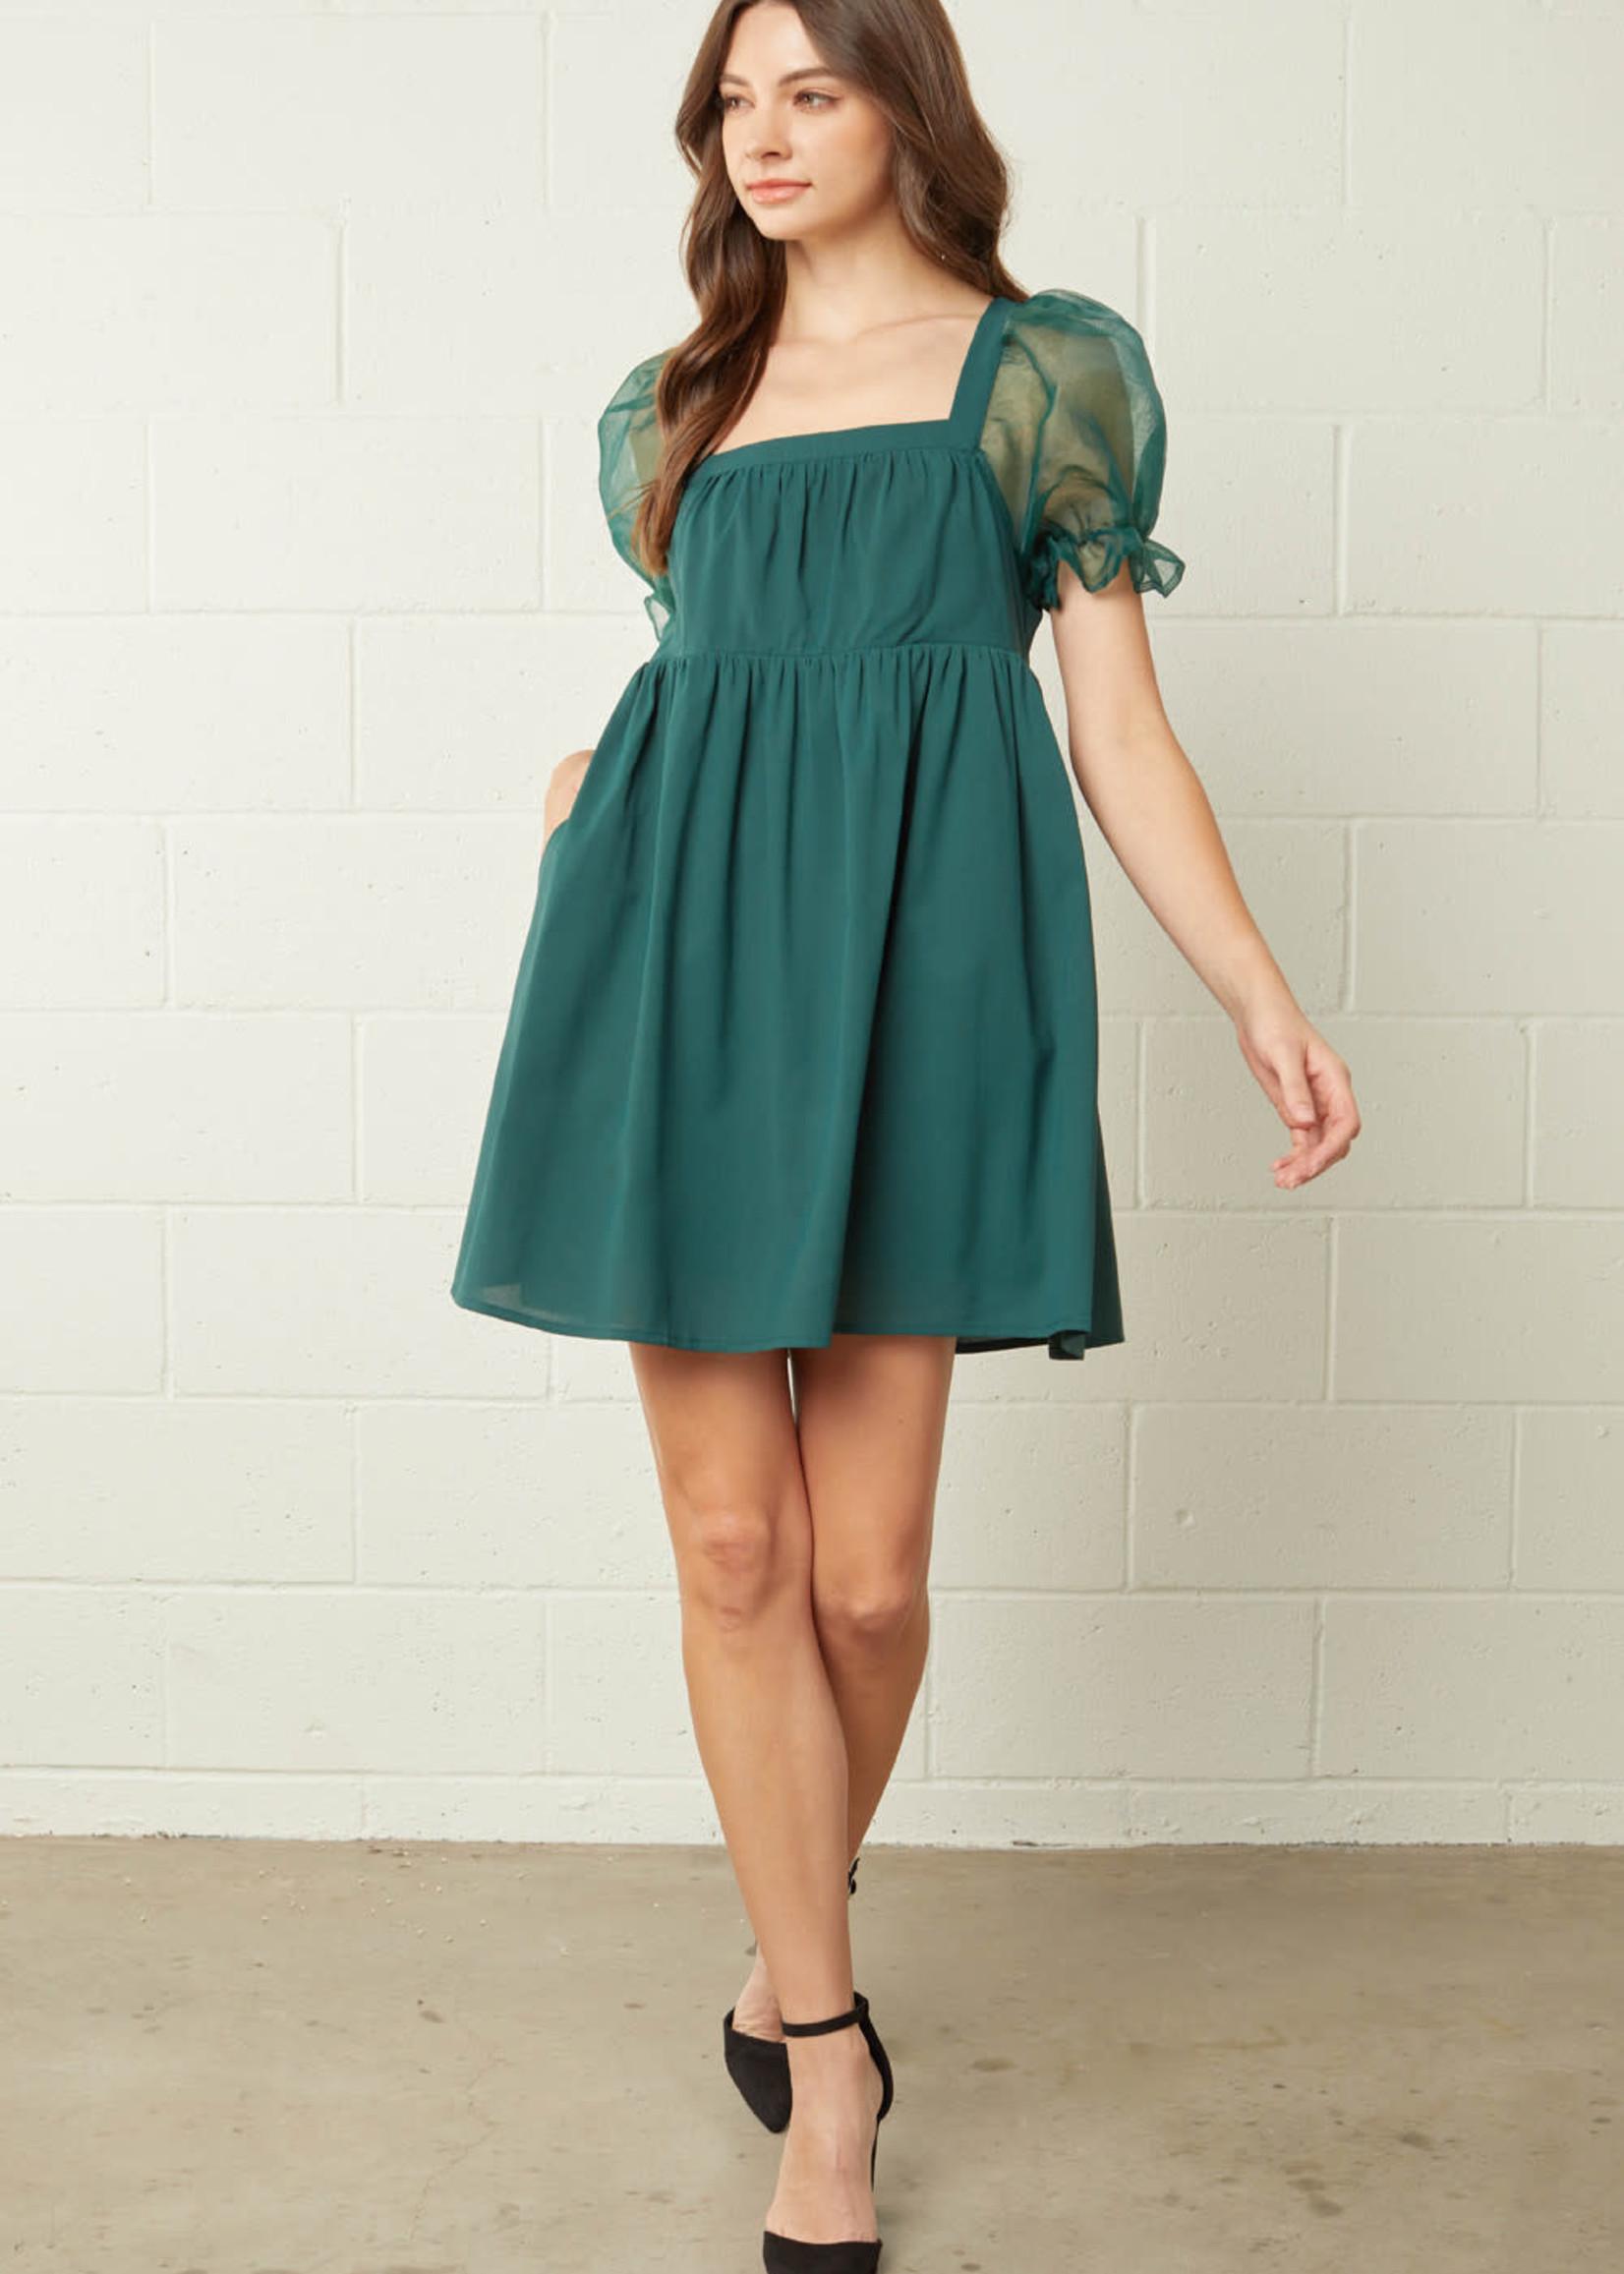 Sheer Delight Hunter Green Dress